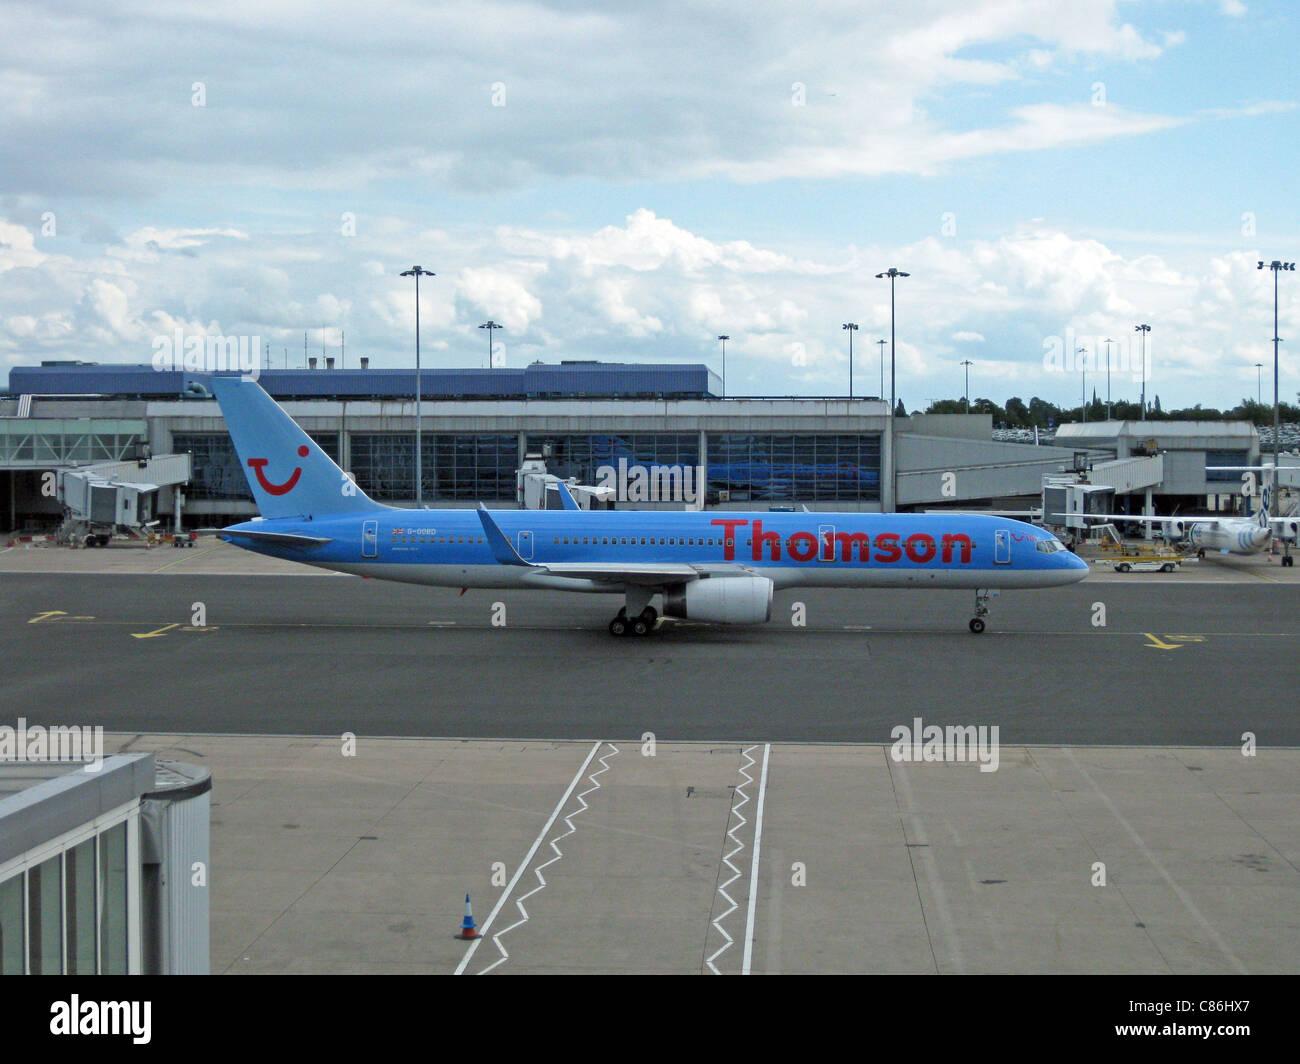 Thomson Airways Boeing 757-200 with blended winglets, registration number G-OOBD, Birmingham International Airport, - Stock Image